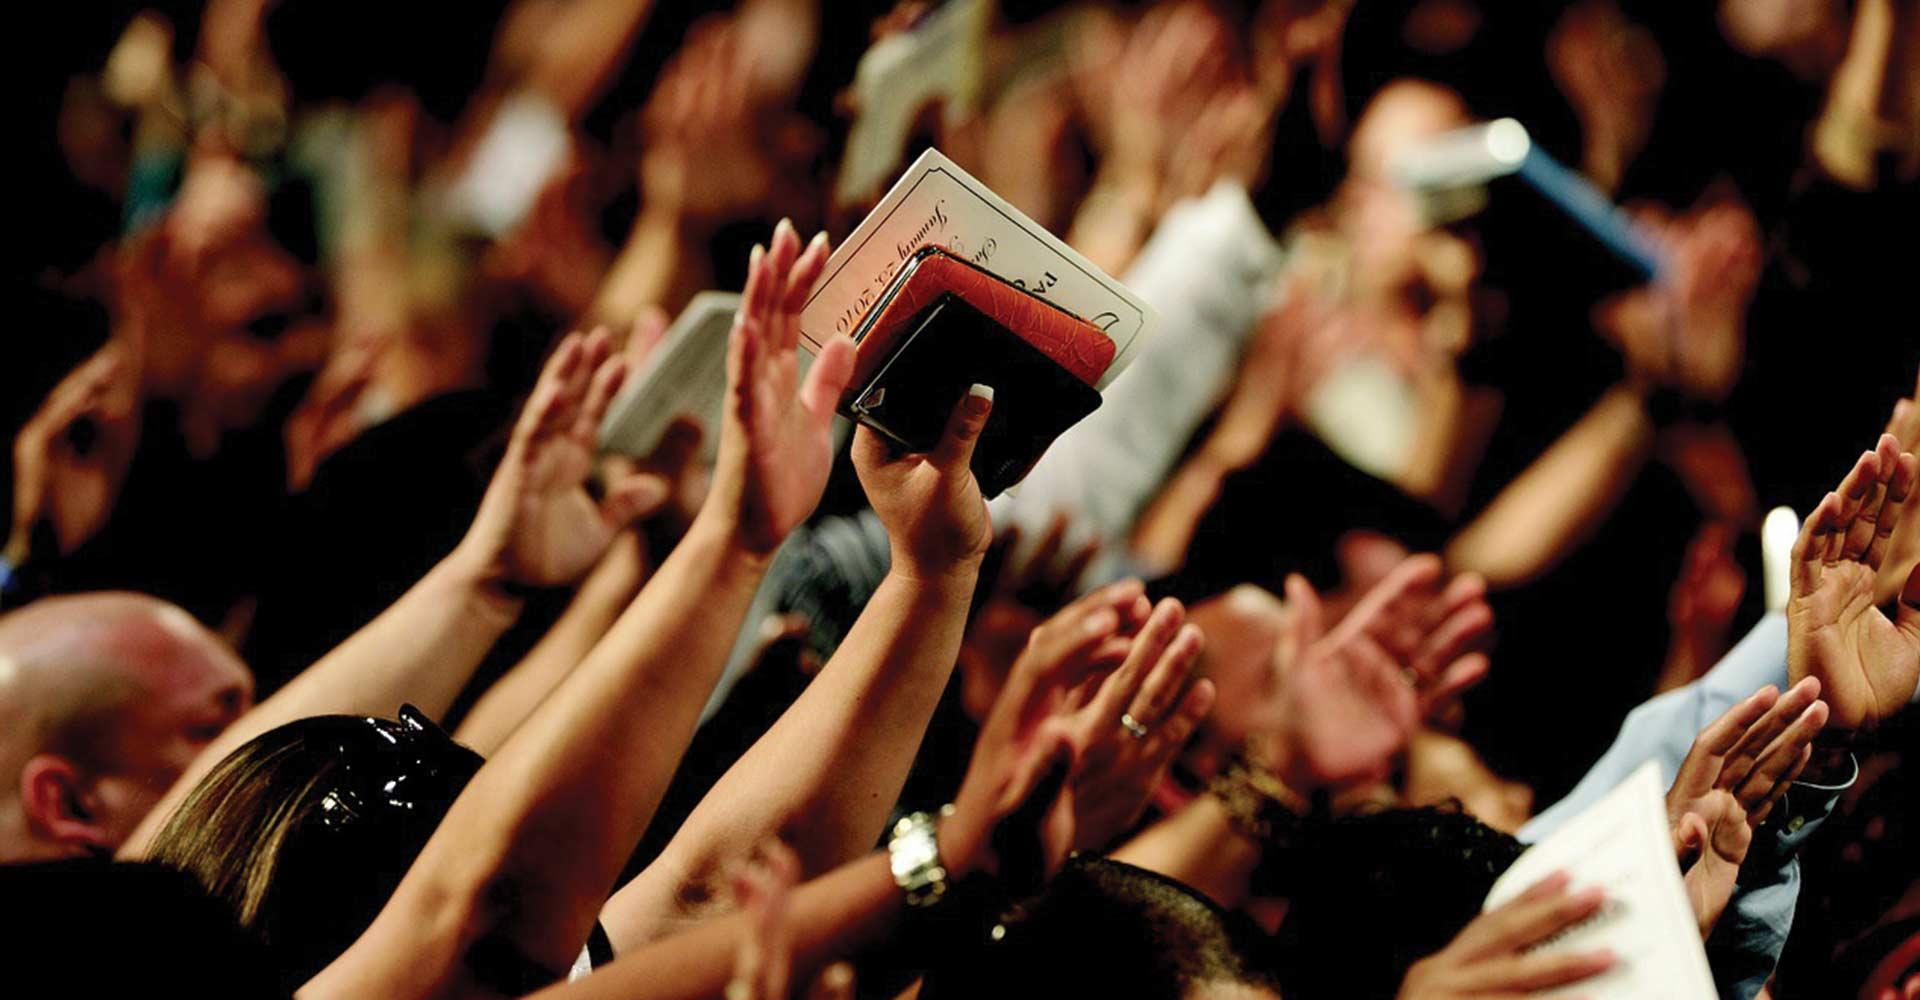 Genuine New Testament Worship